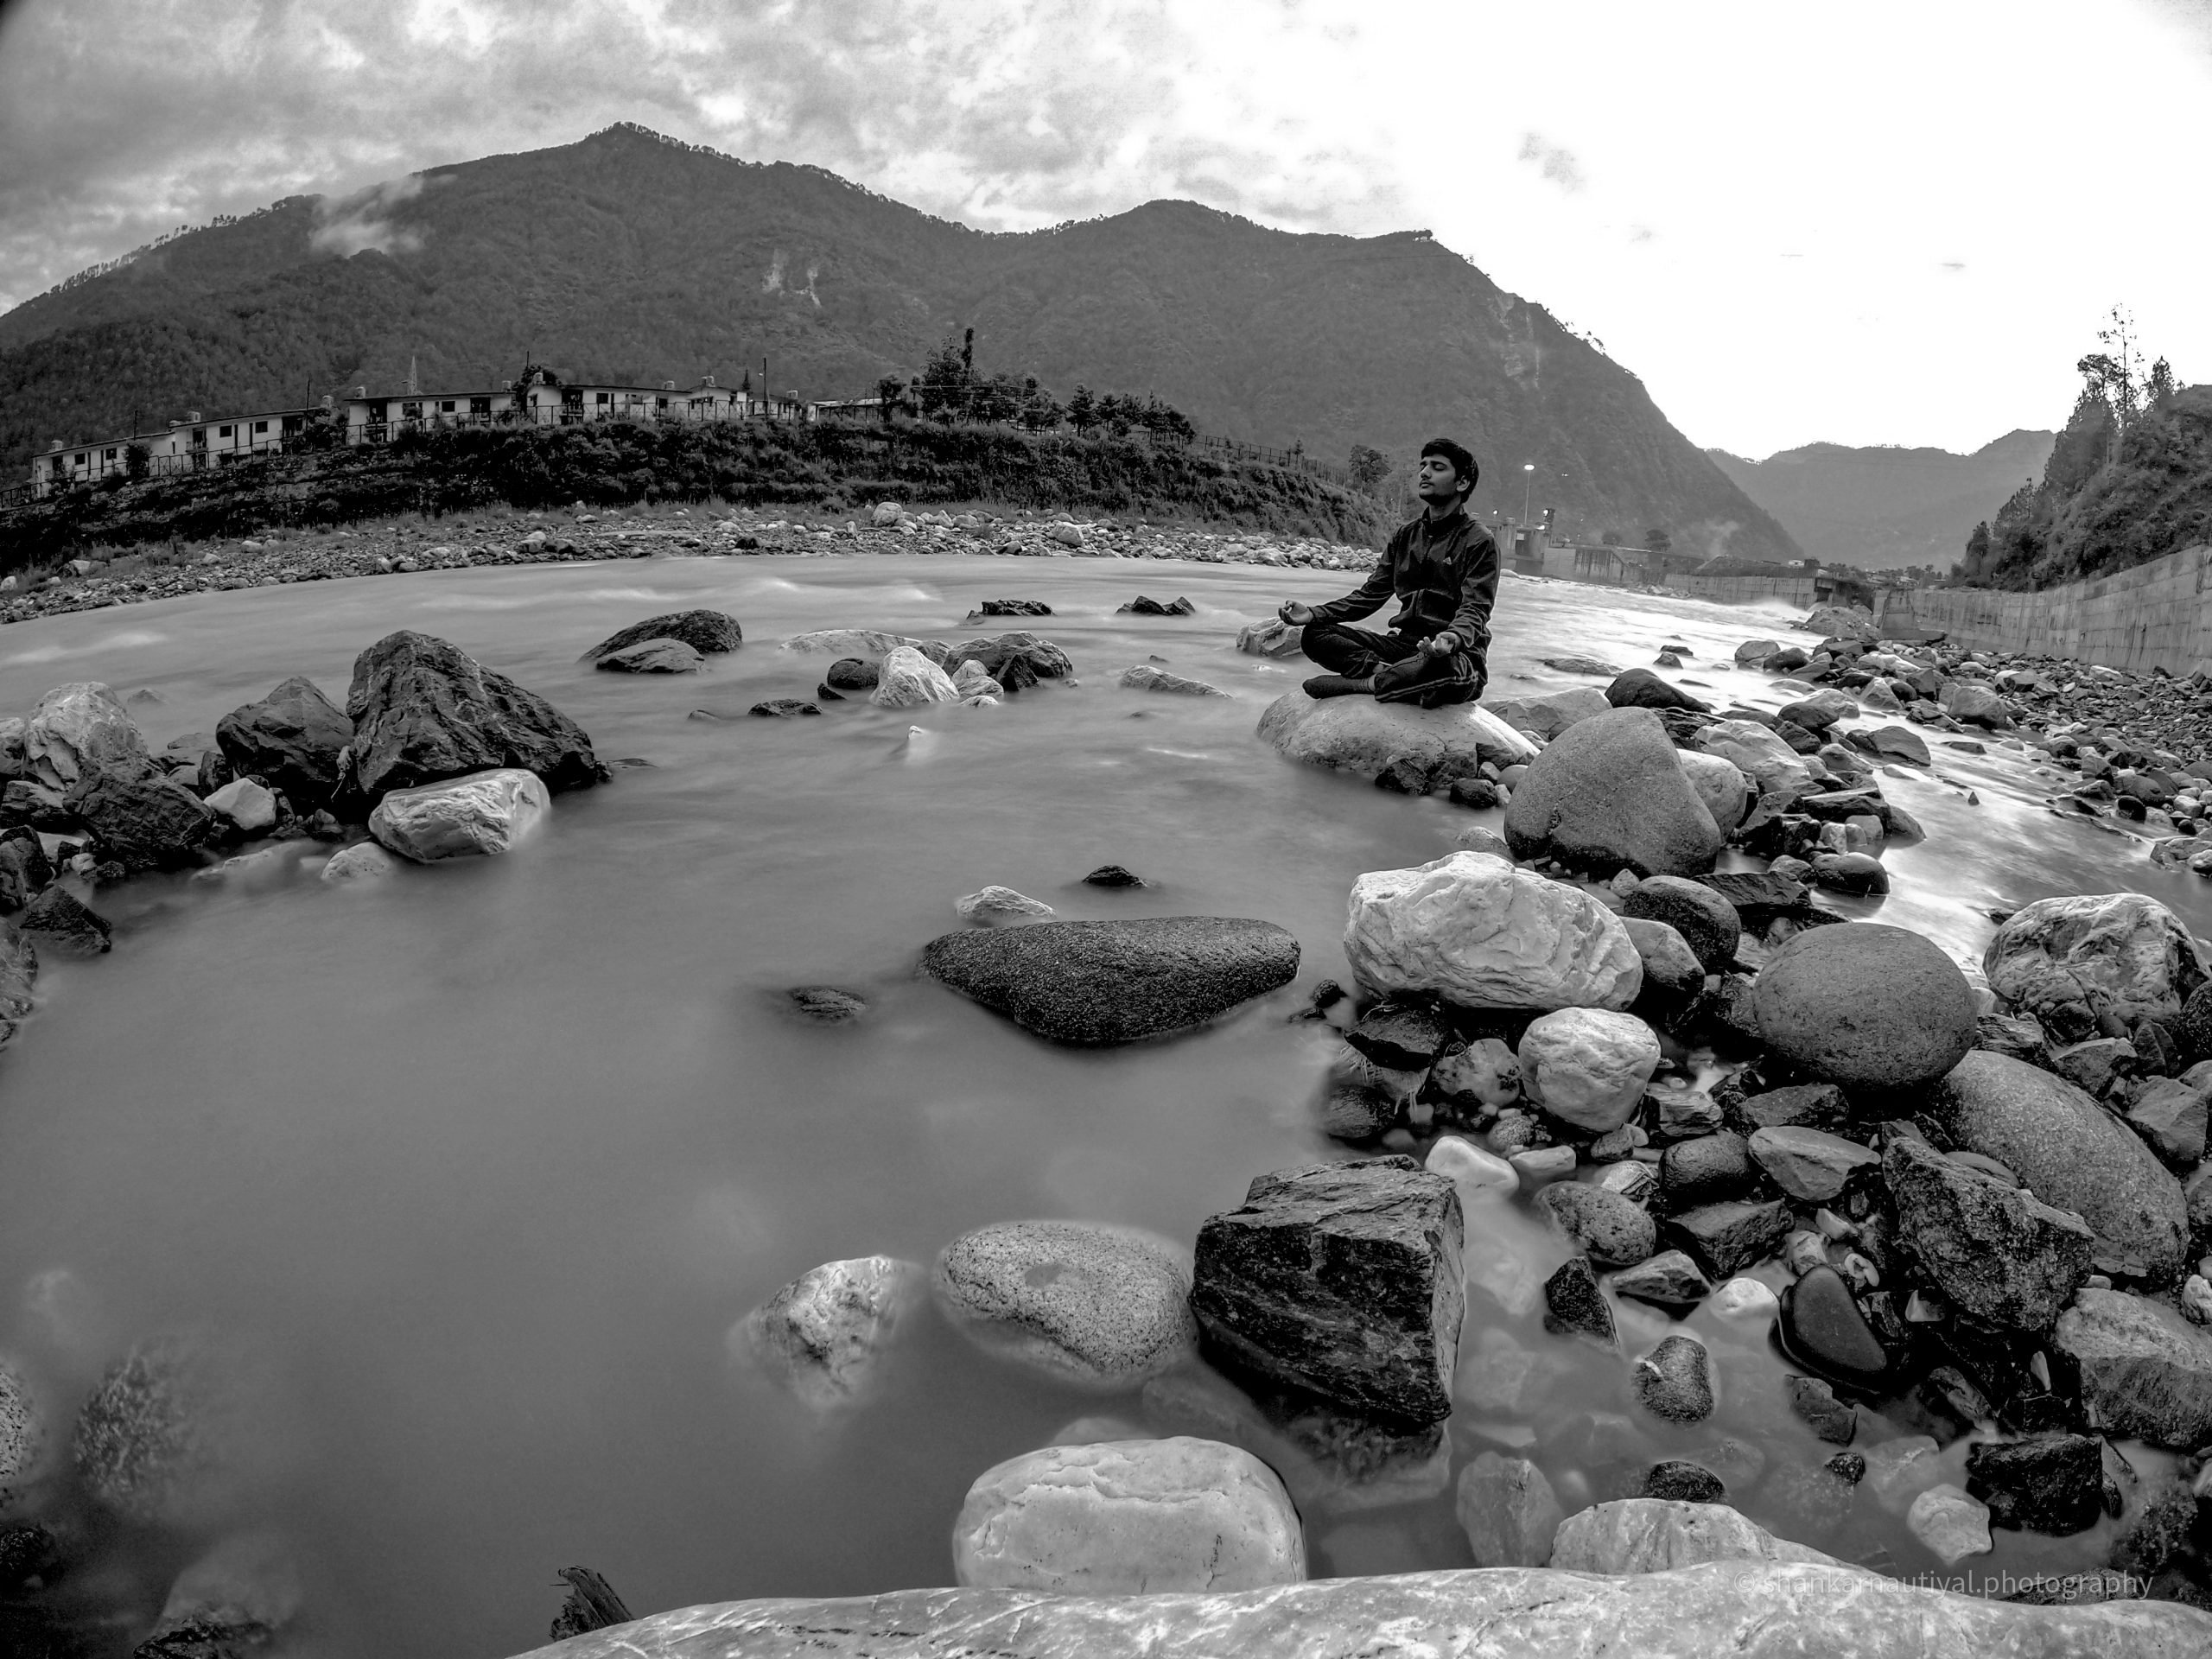 Yoga on river rocks